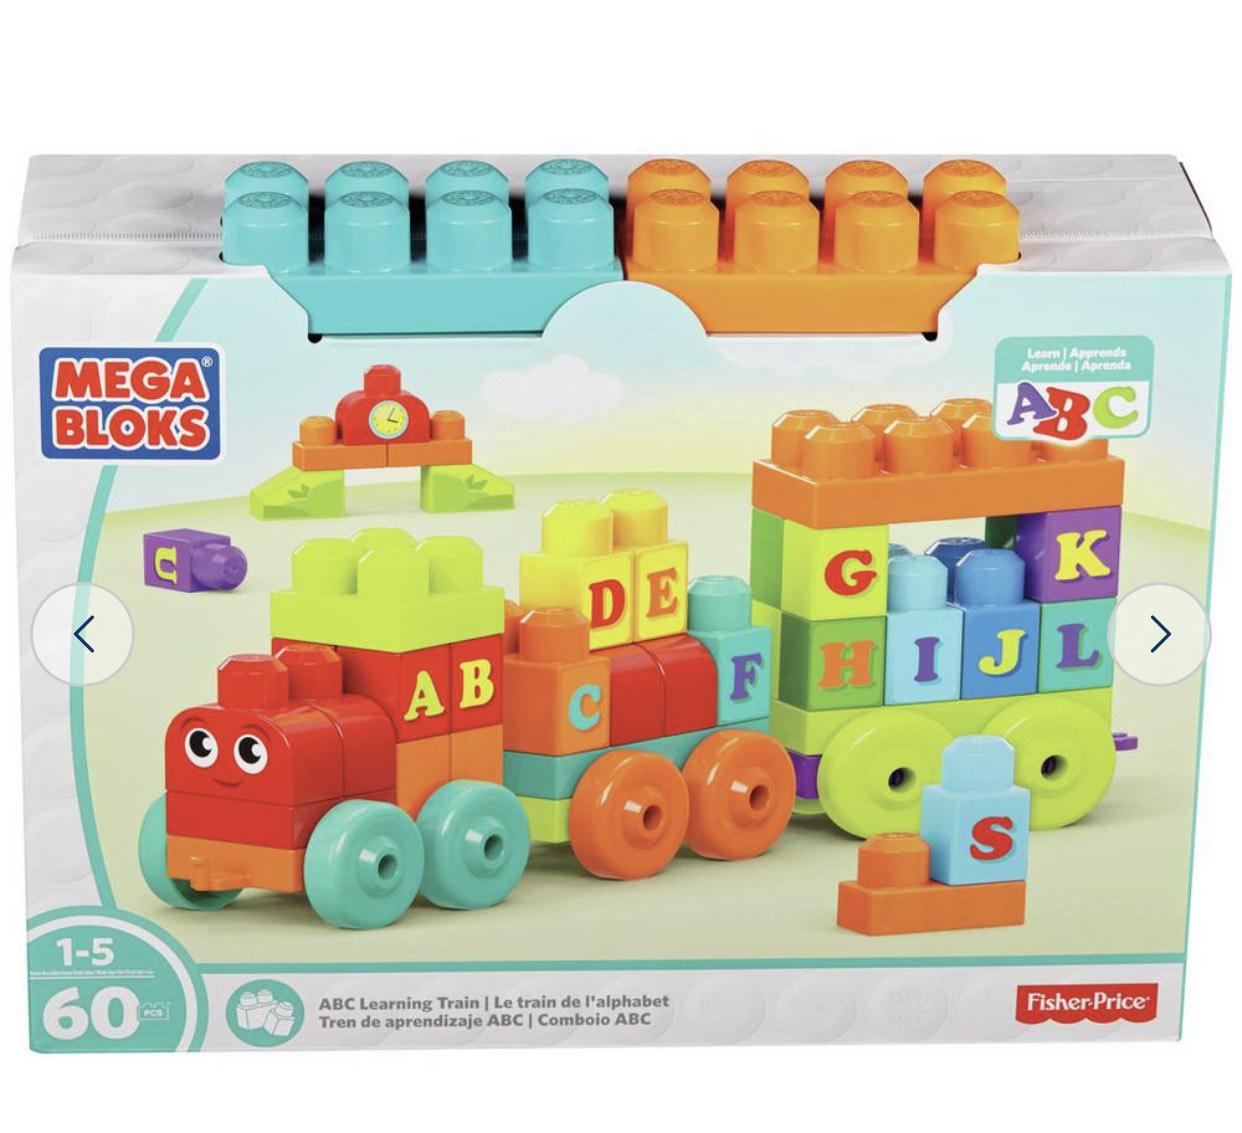 Mega Bloks ABC Learning Train 60pc £6.40 @ Argos